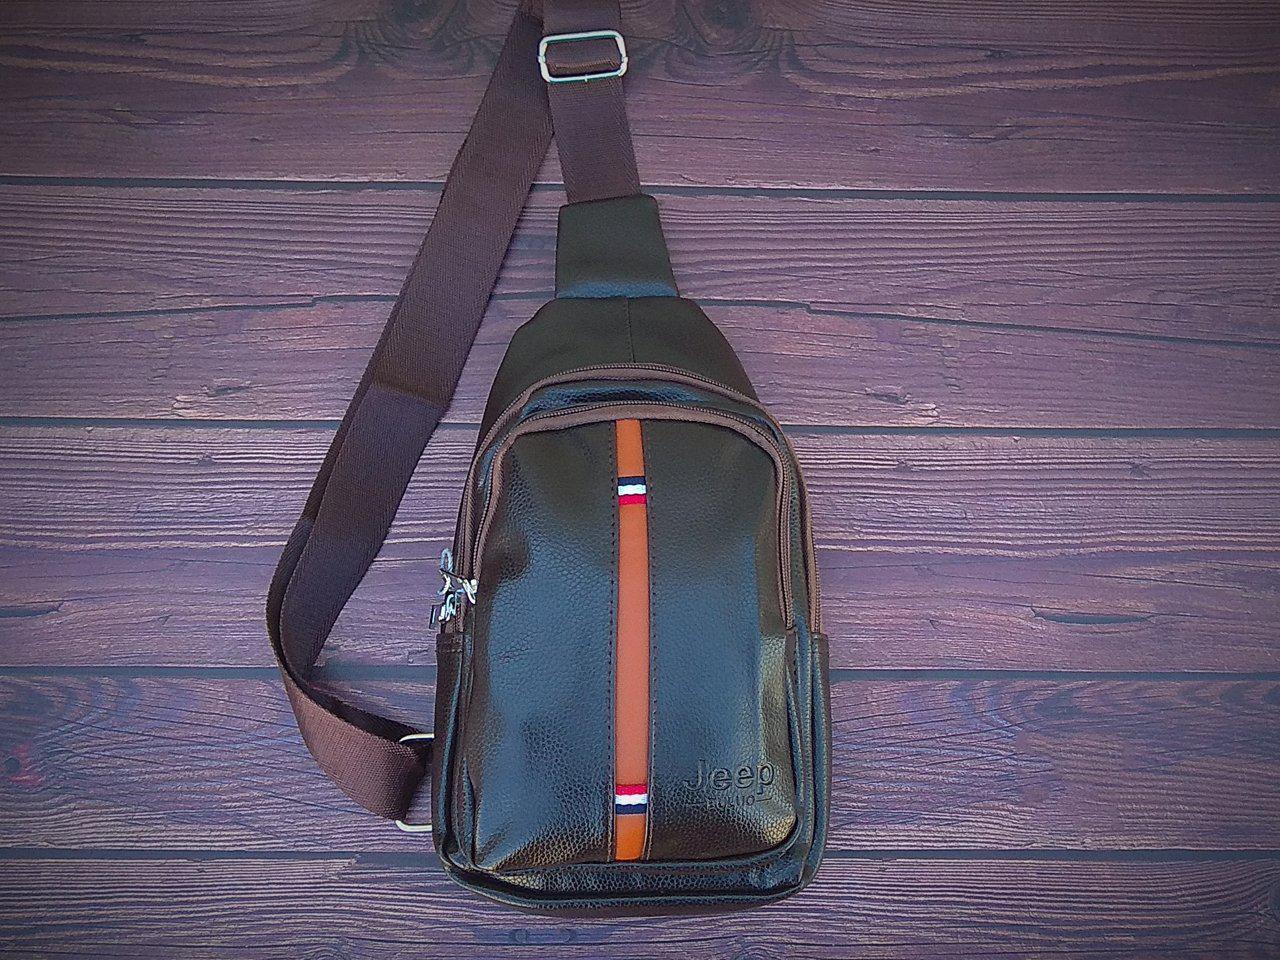 Сумка-рюкзак на одно плечо в стиле Jeep коричневая